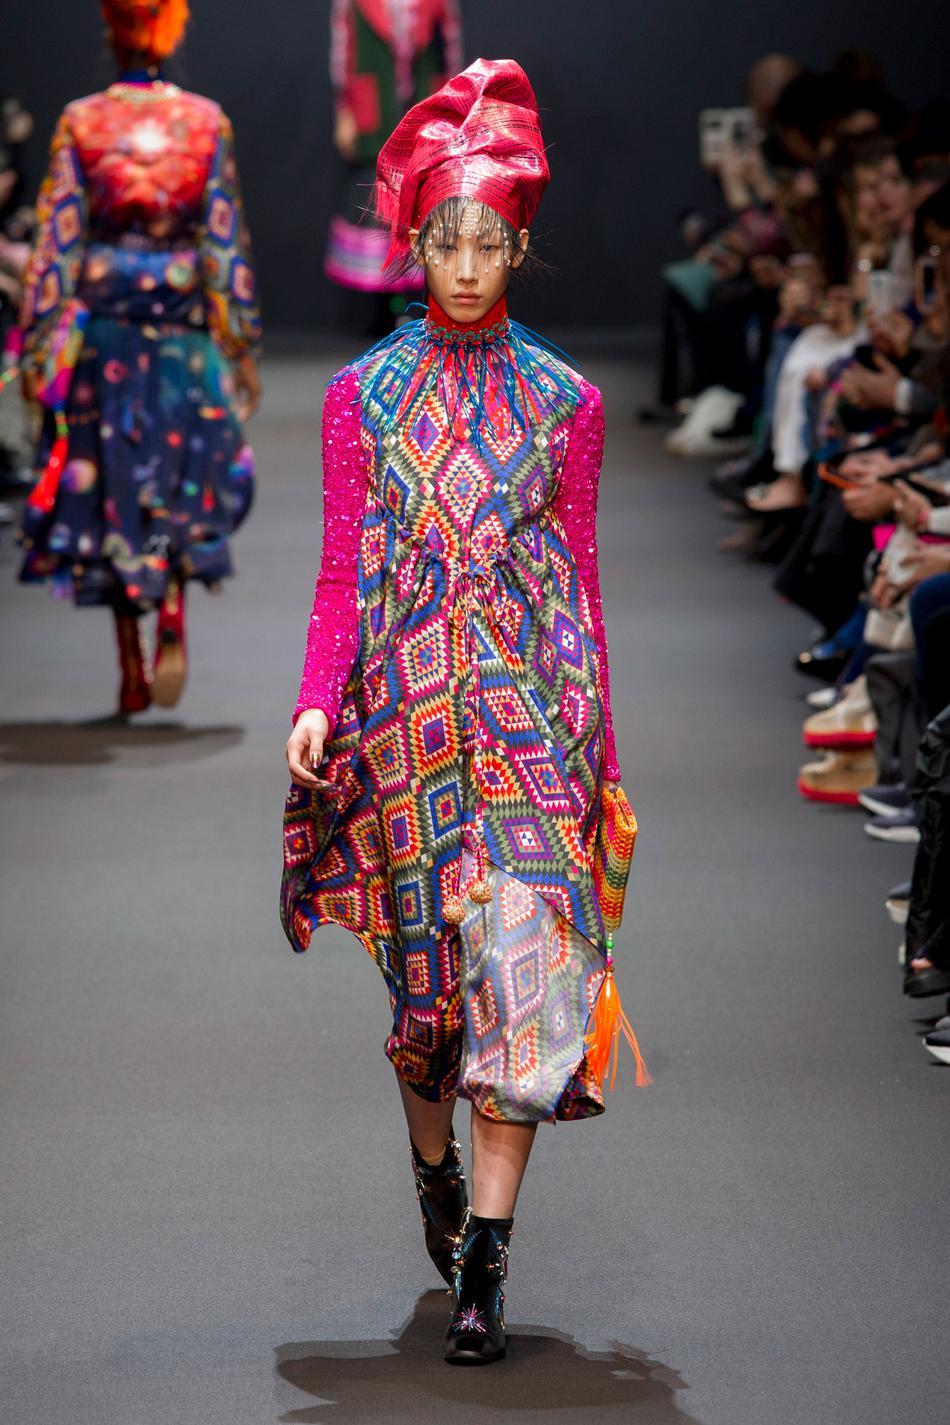 Défilé Manish Arora Fashion Week 2017 - Look 8